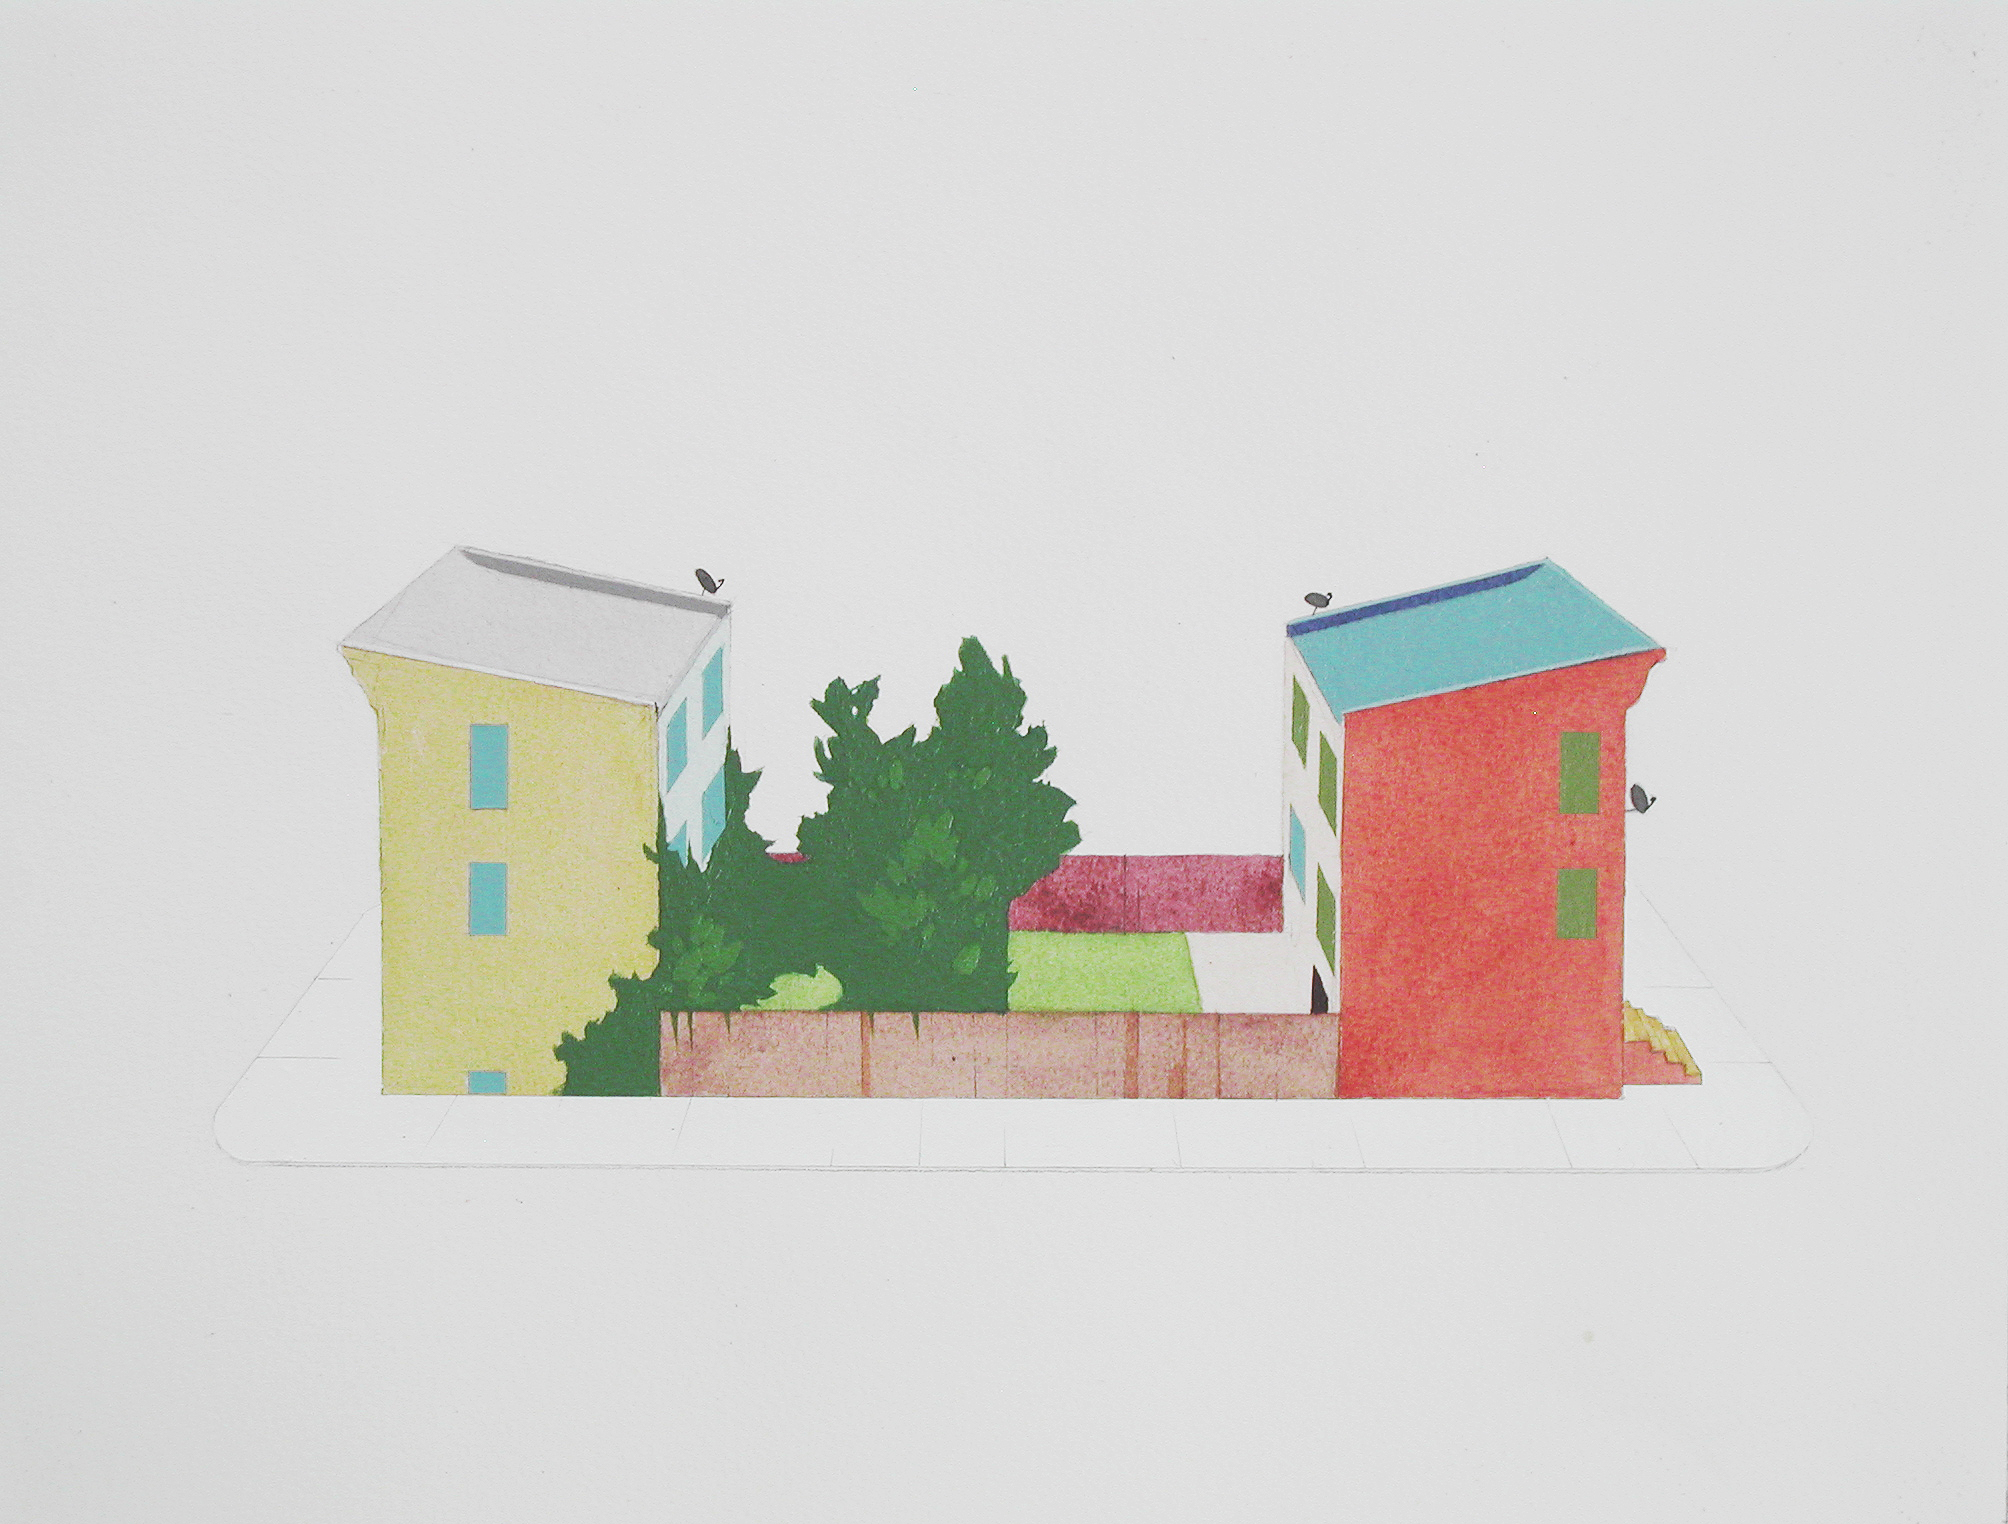 Chris Ballantyne   Short Block  2014 acrylic on paper 12 x 16 in